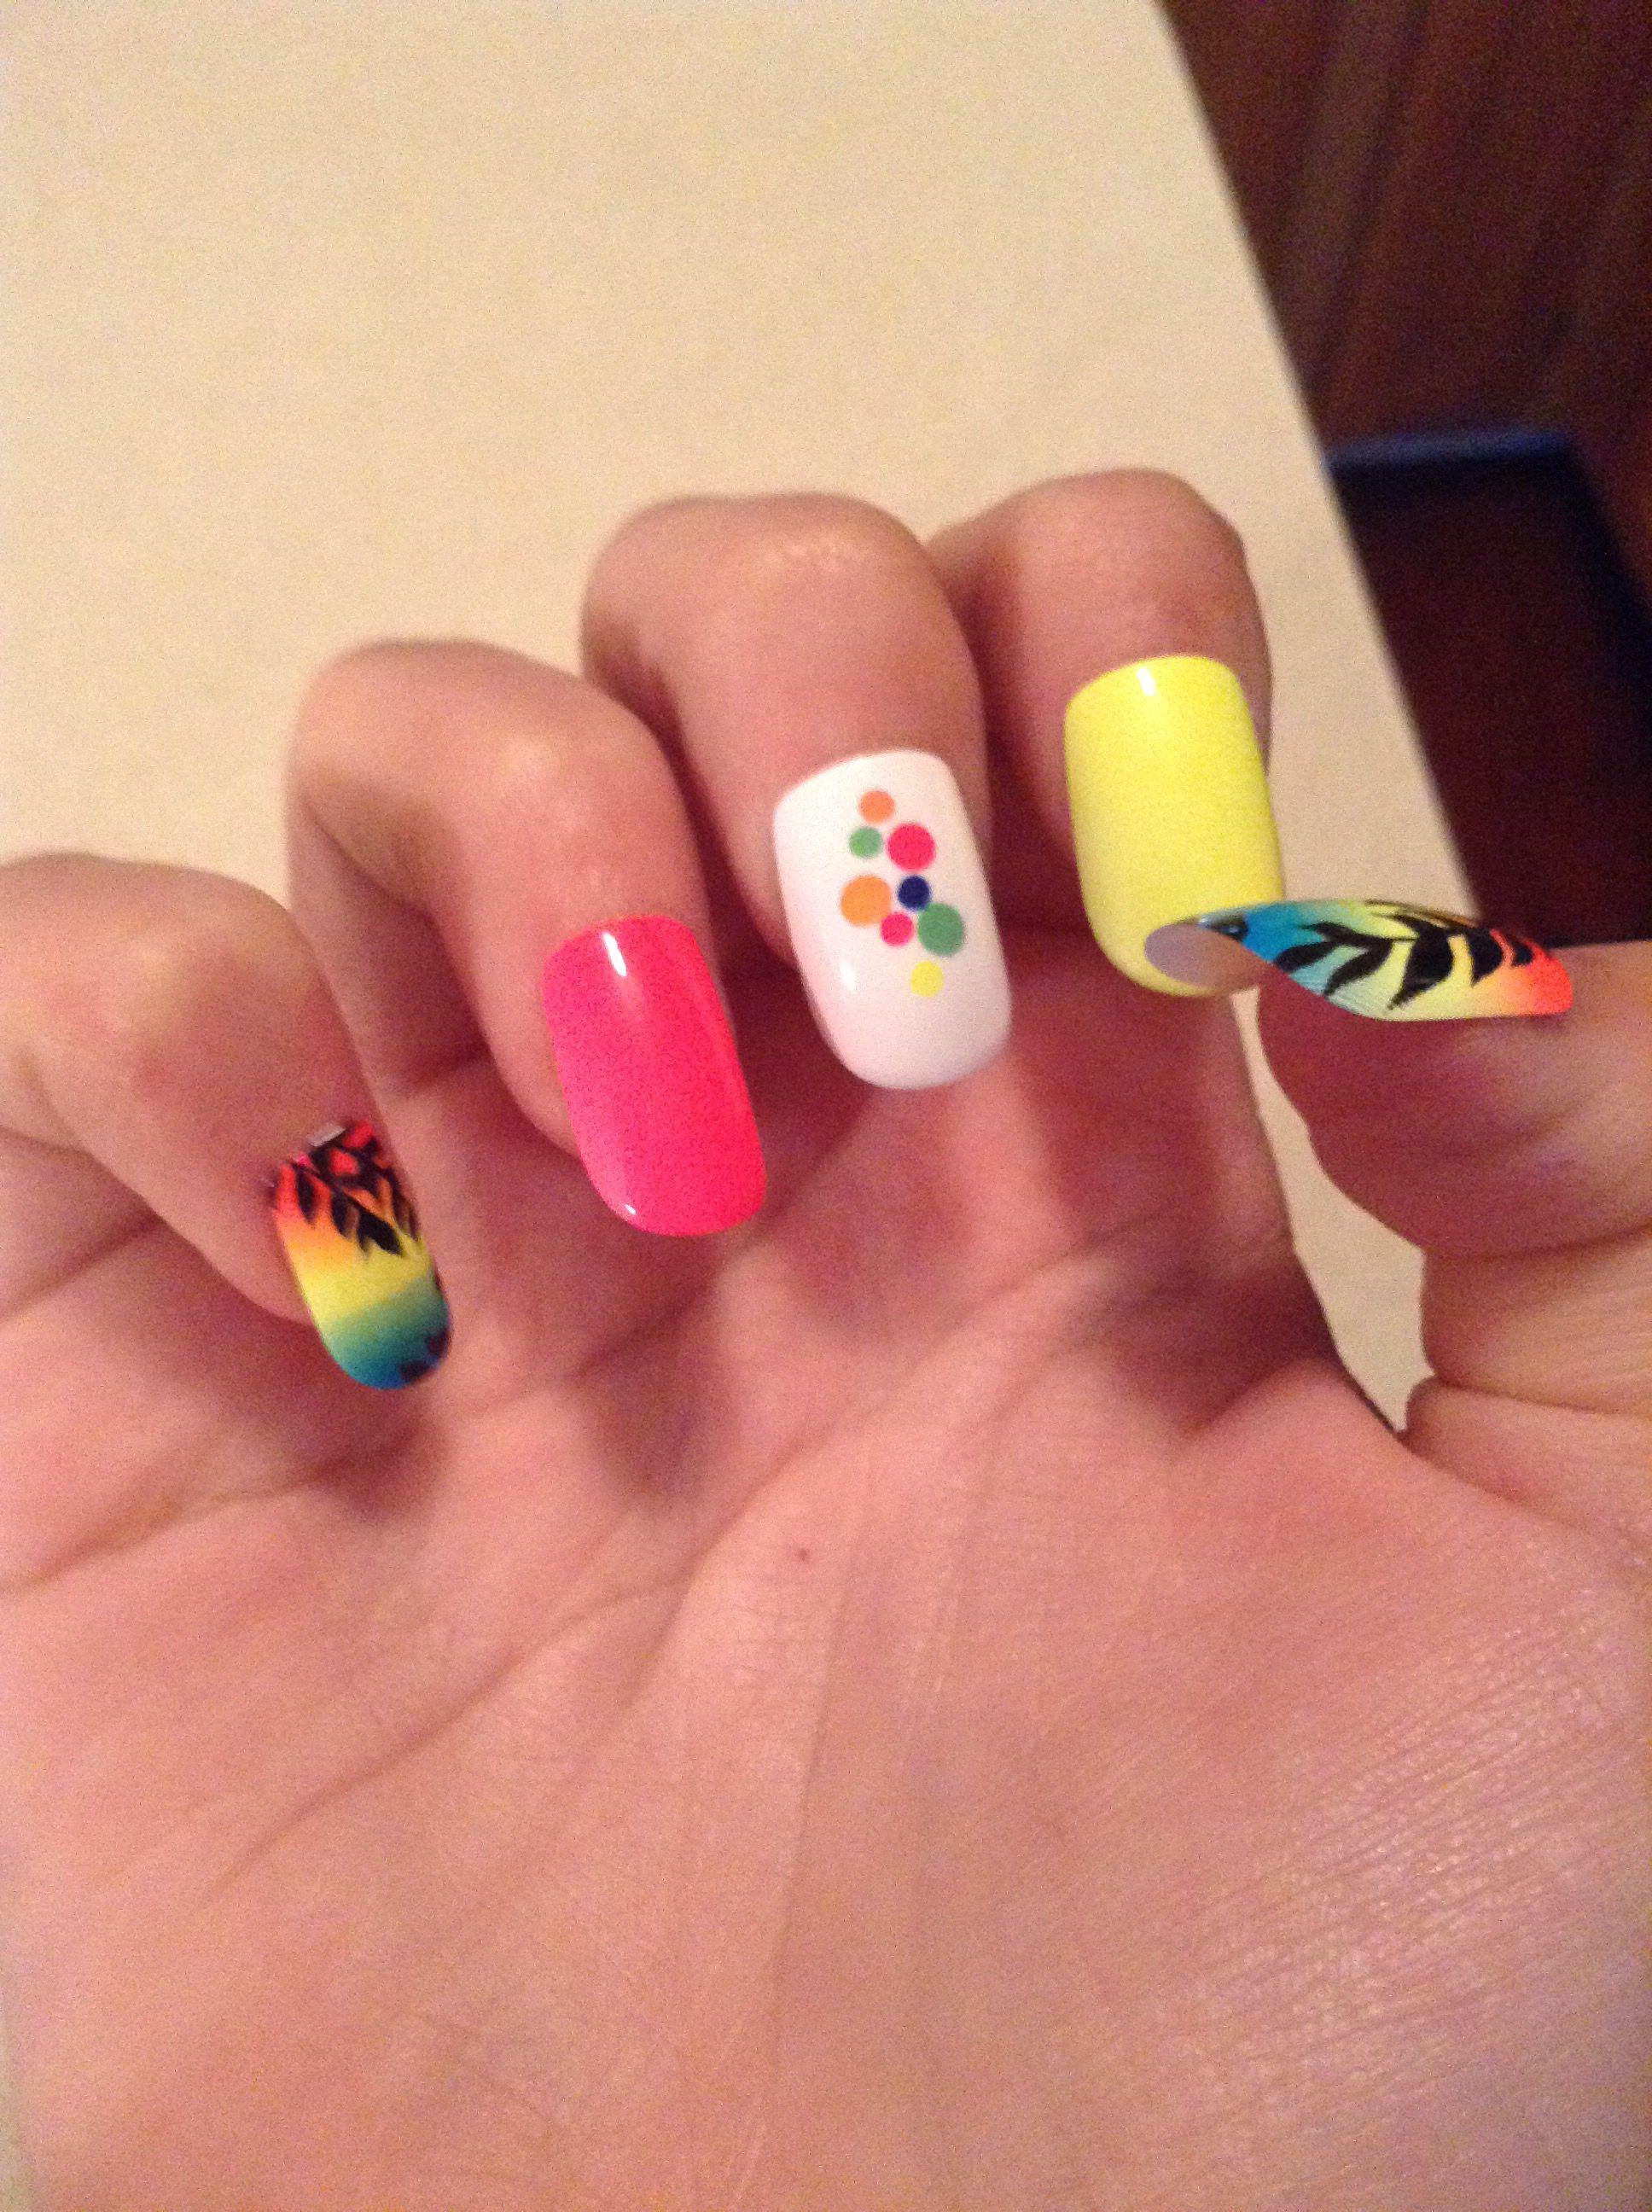 Kiss fake nail design | kiss | Pinterest